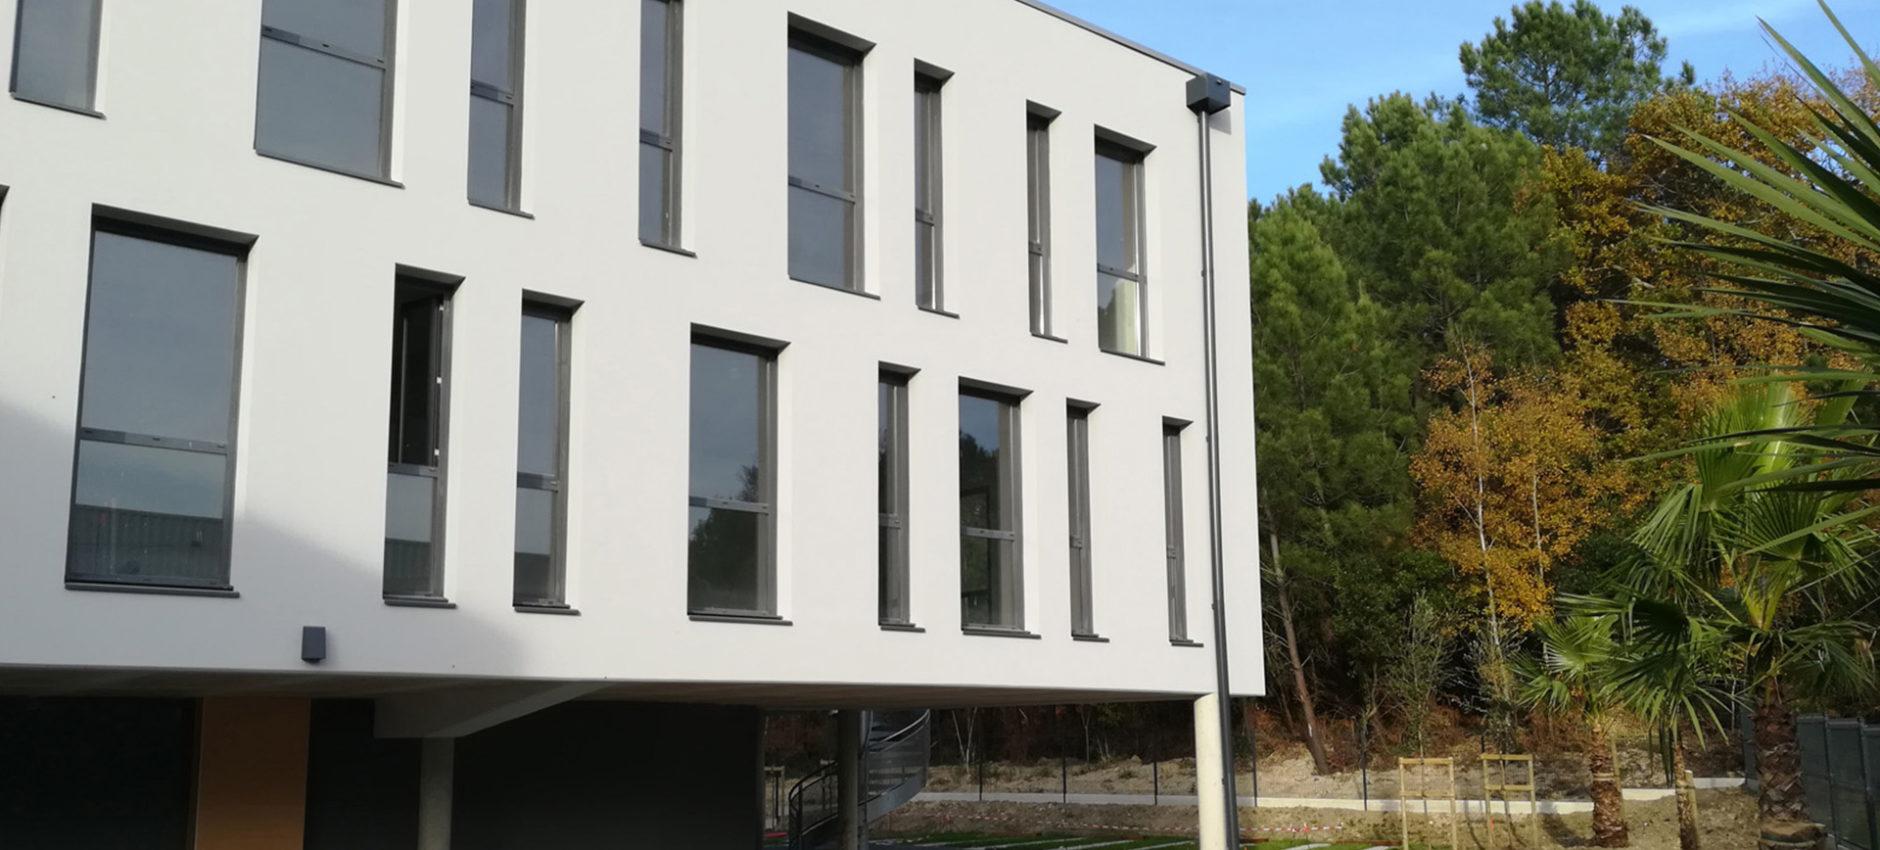 boca_architecture_projet_immeuble_bureau_recif_02.jpg